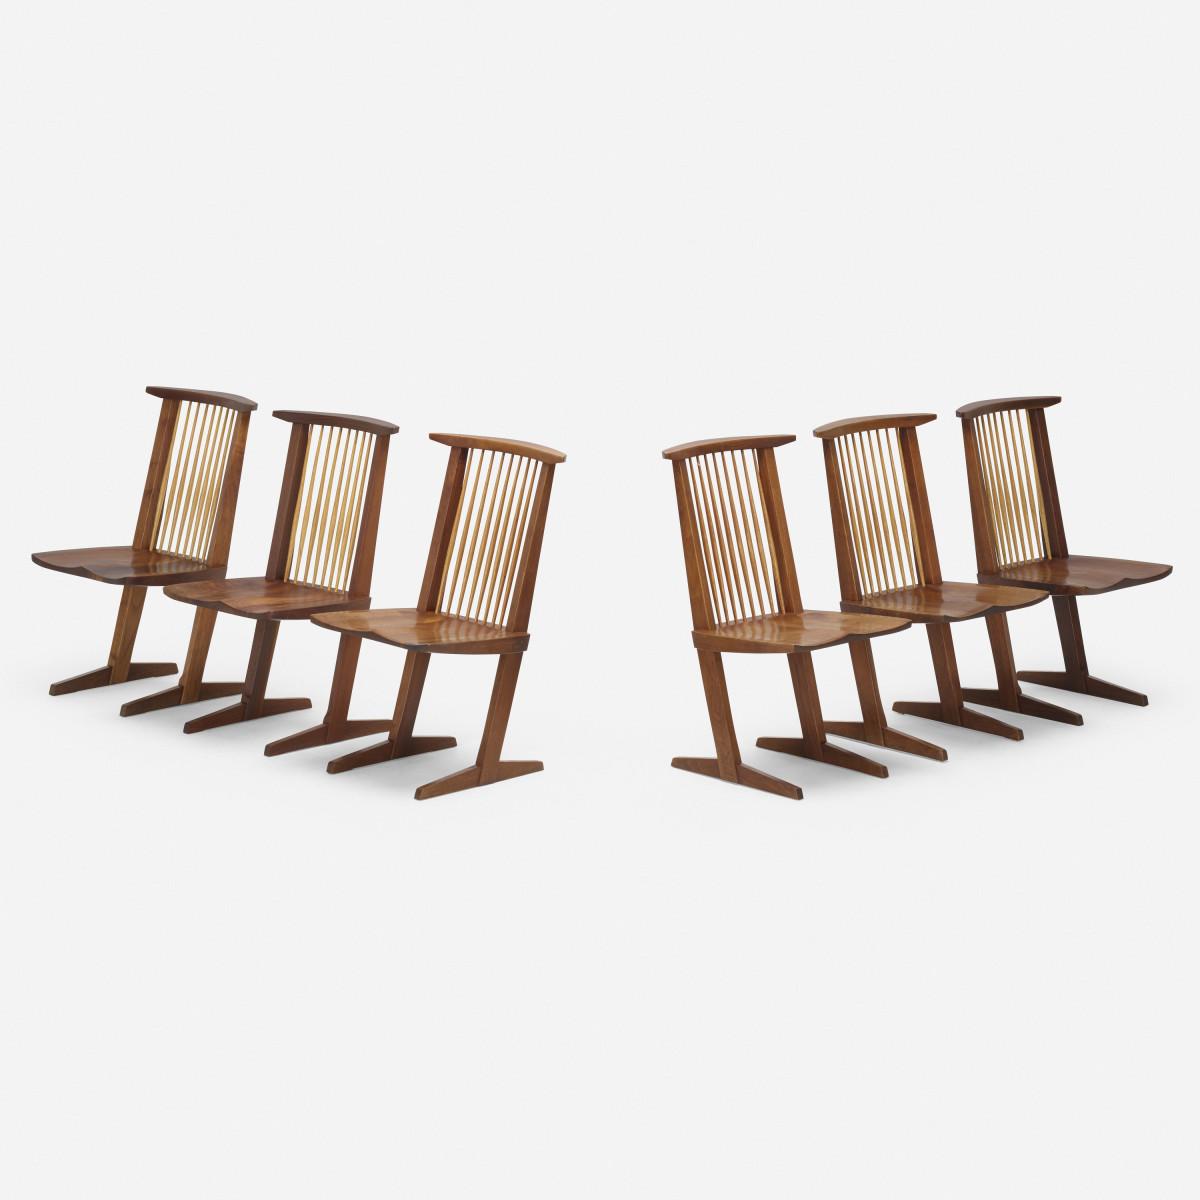 "Set of 6 George Nakashima Conoid chairs, Nakashima Studio, 1988, American black walnut and hickory, 35-3/4"" h × 20"" w × 21"" d; $33,800."